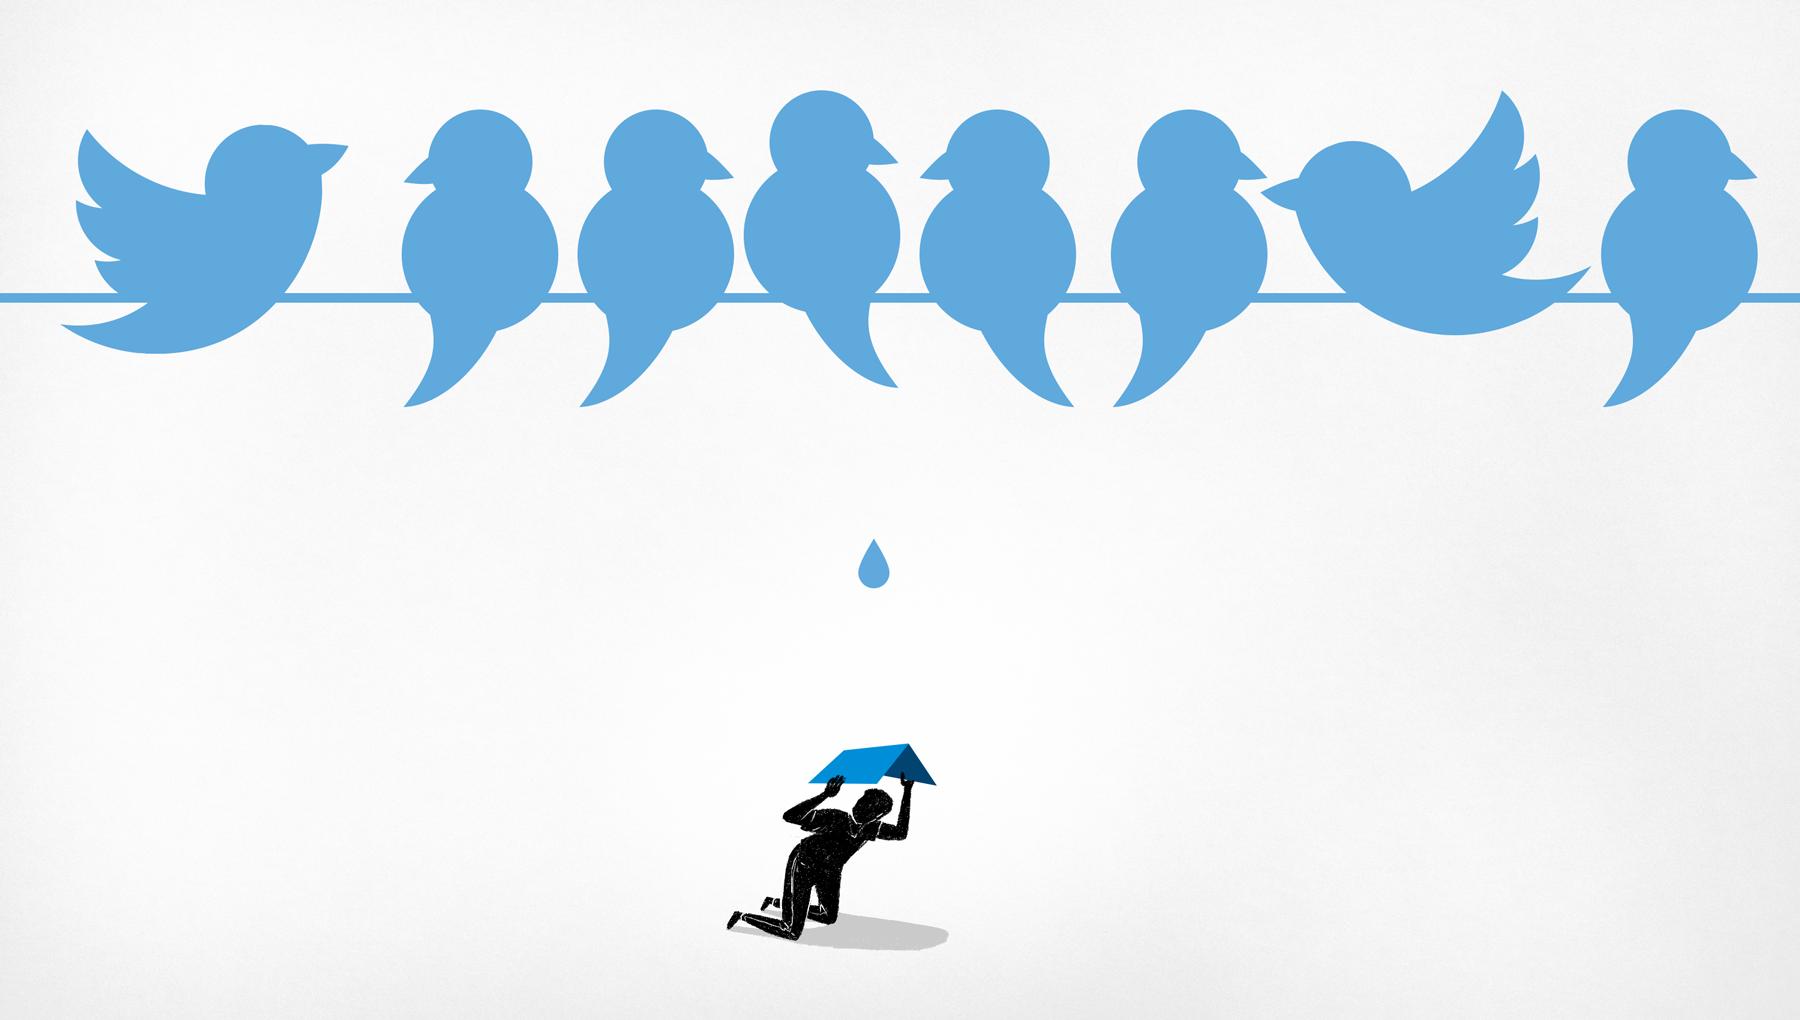 filtering privacy social-media social-networks twitter